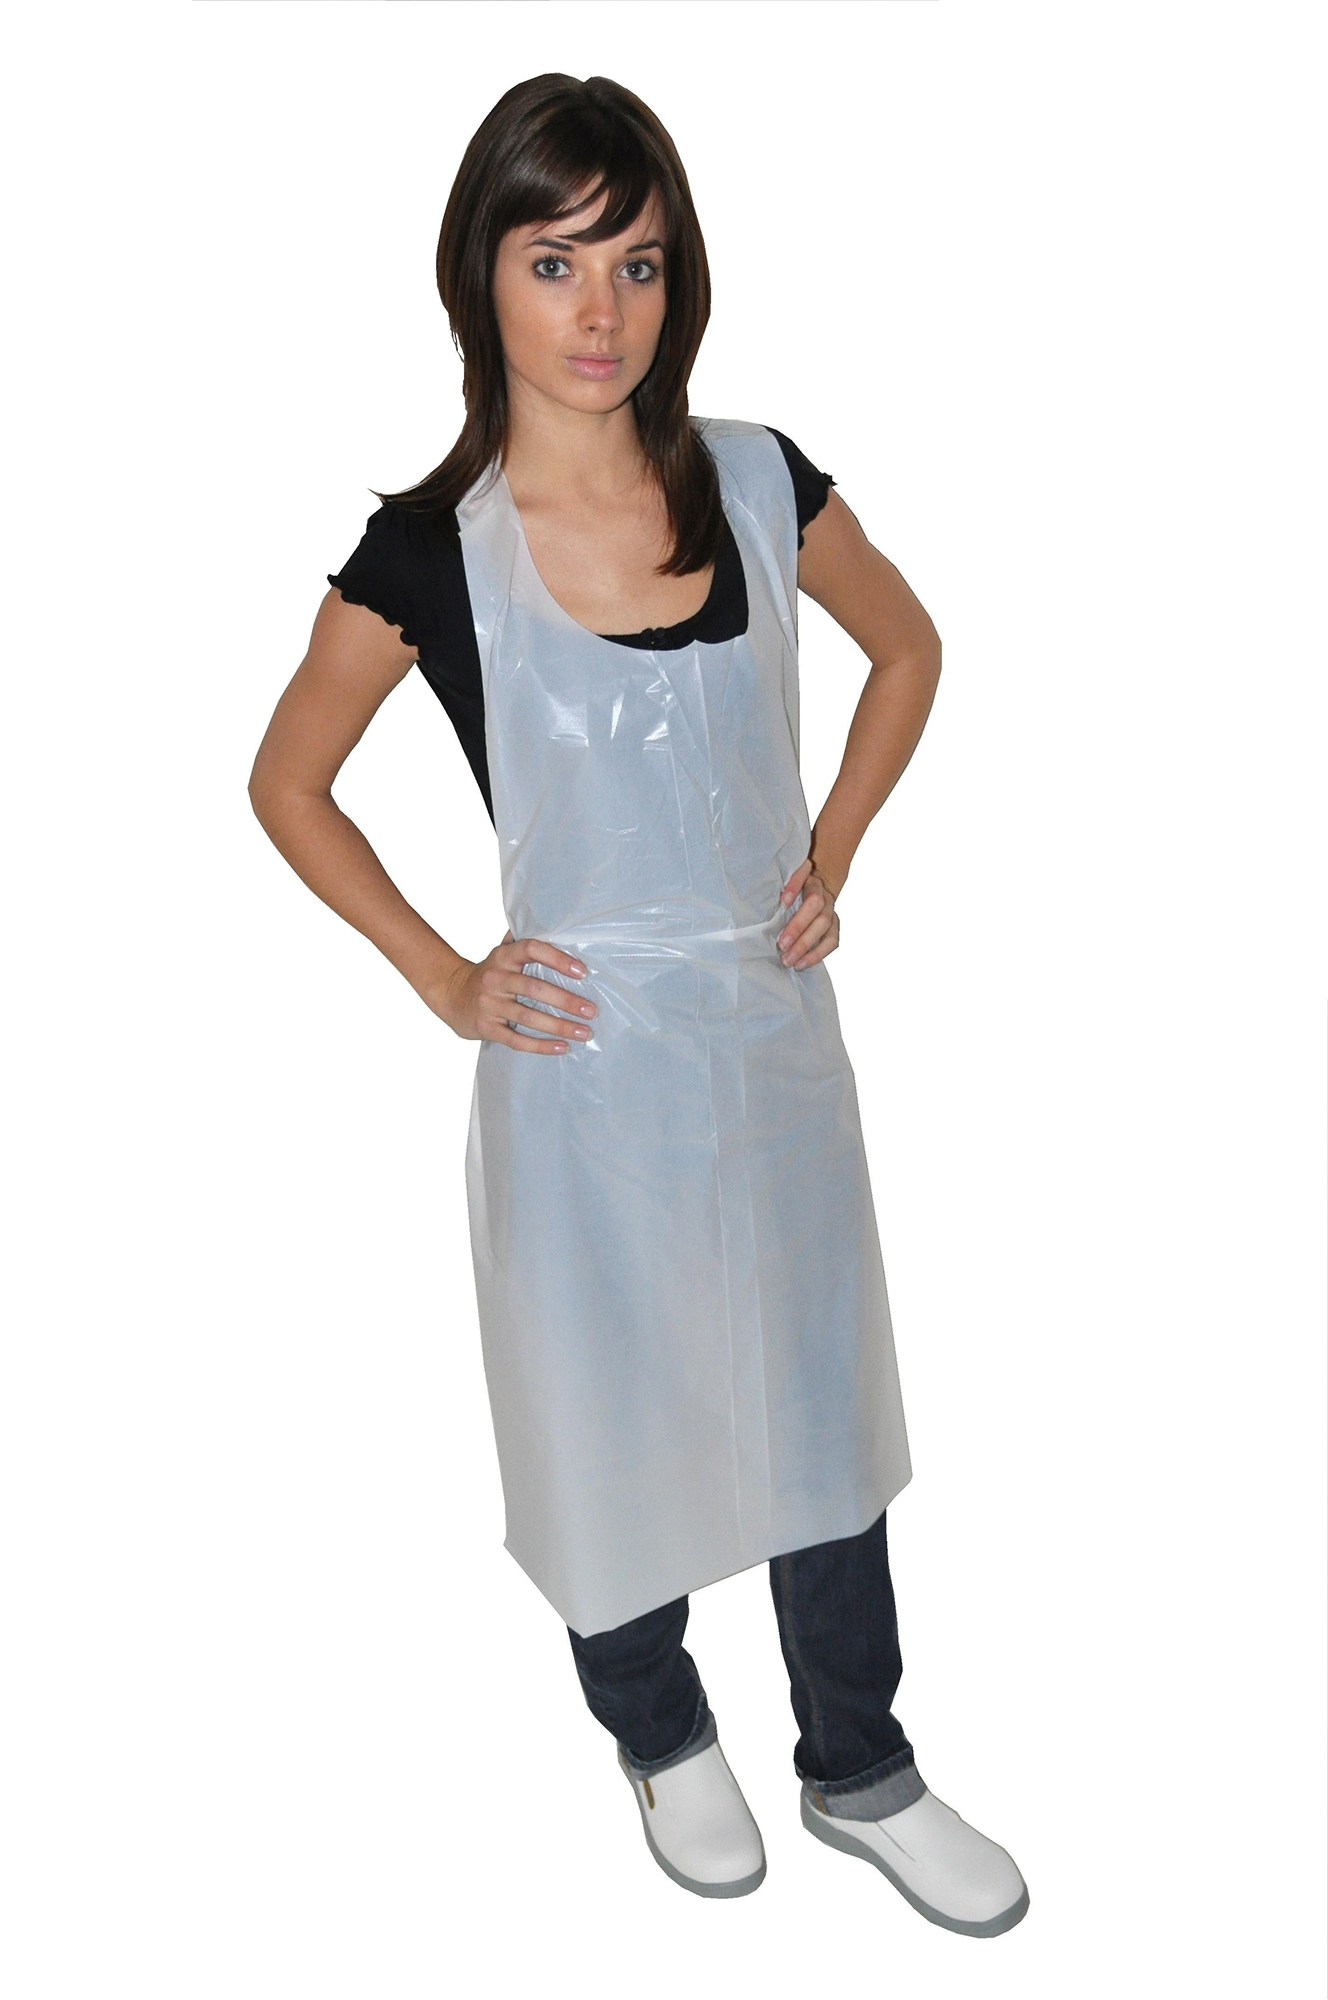 White disposable apron - White Disposable Apron 45